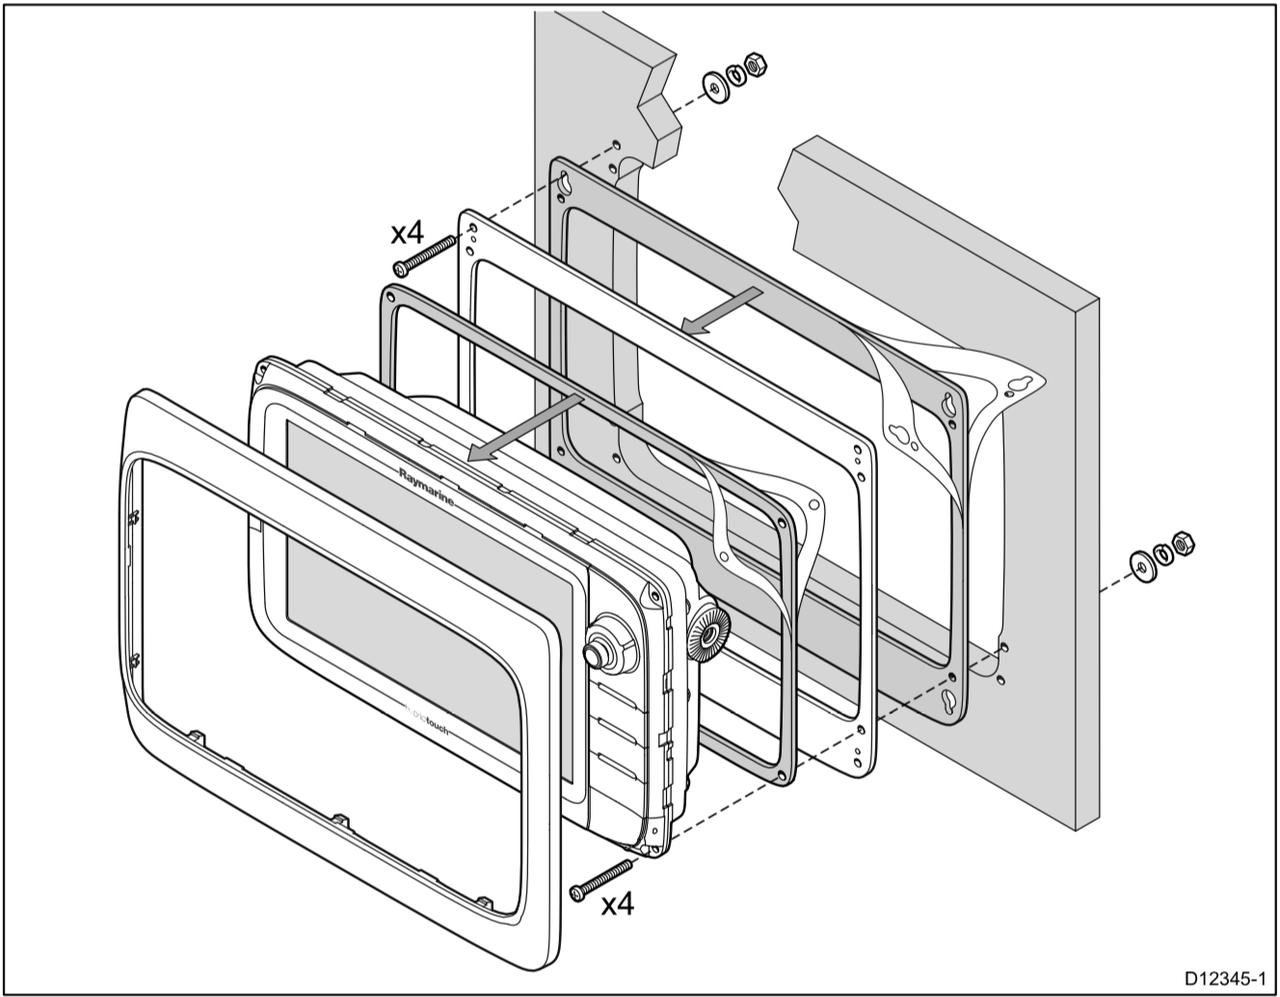 hight resolution of wrg 1822 441s garmin wiring diagram 441s garmin wiring diagram